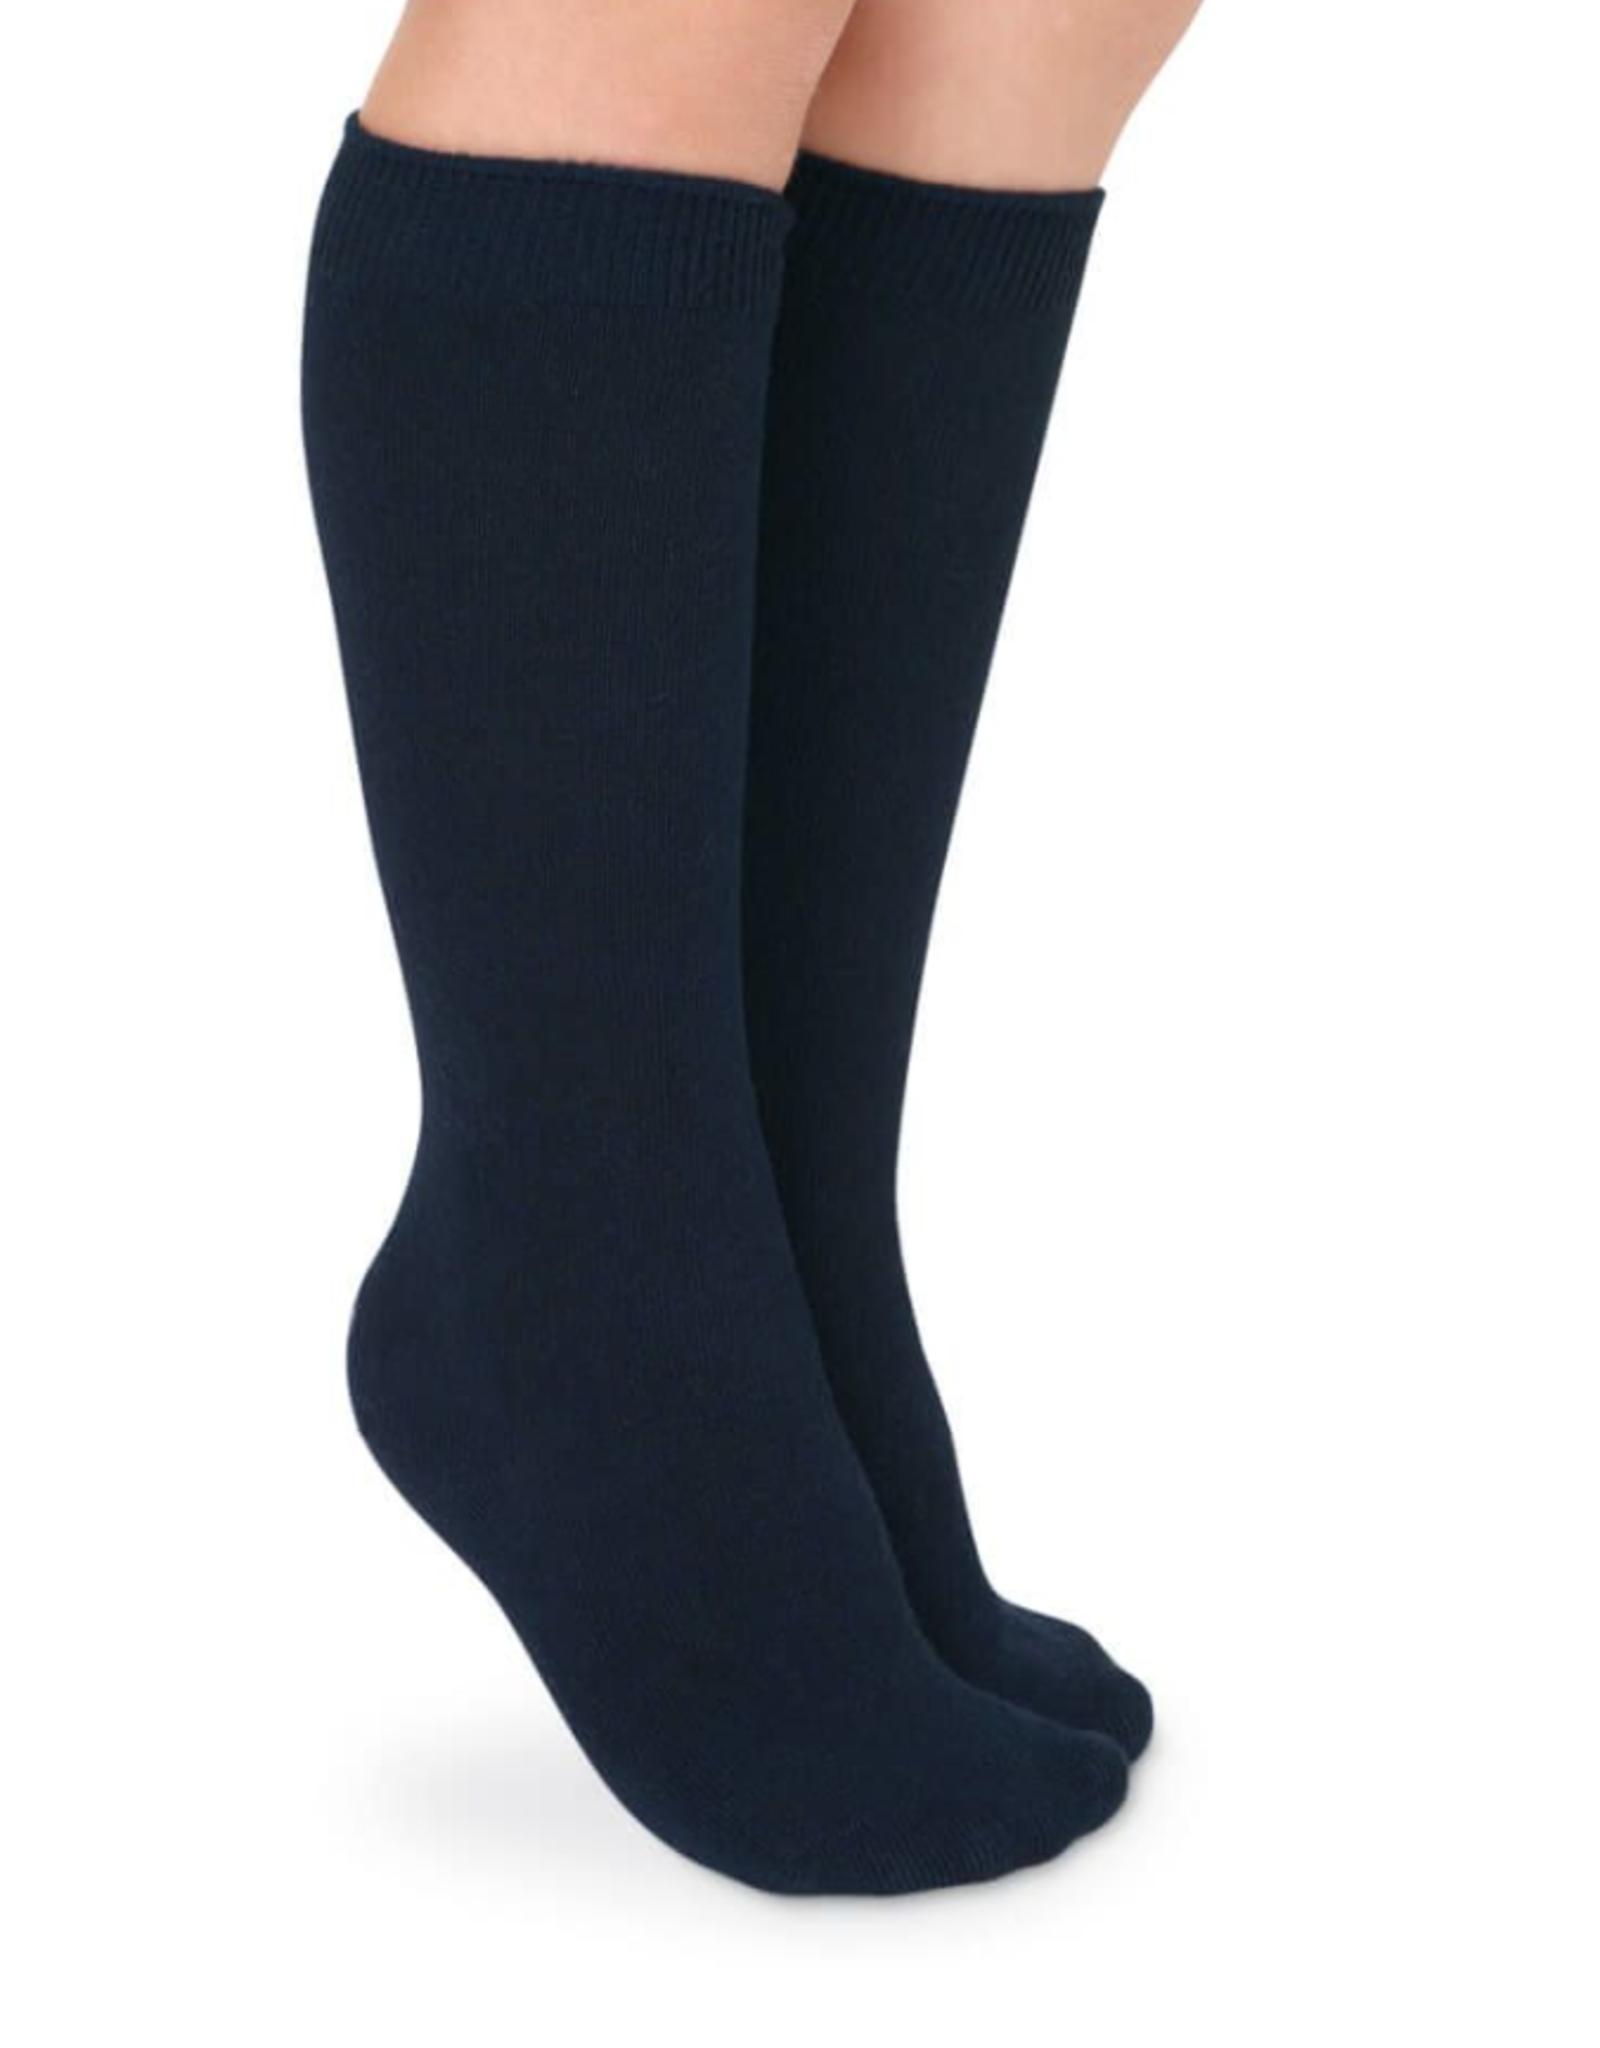 Jefferies Socks Navy Cotton Knee High 2 Pack 1600